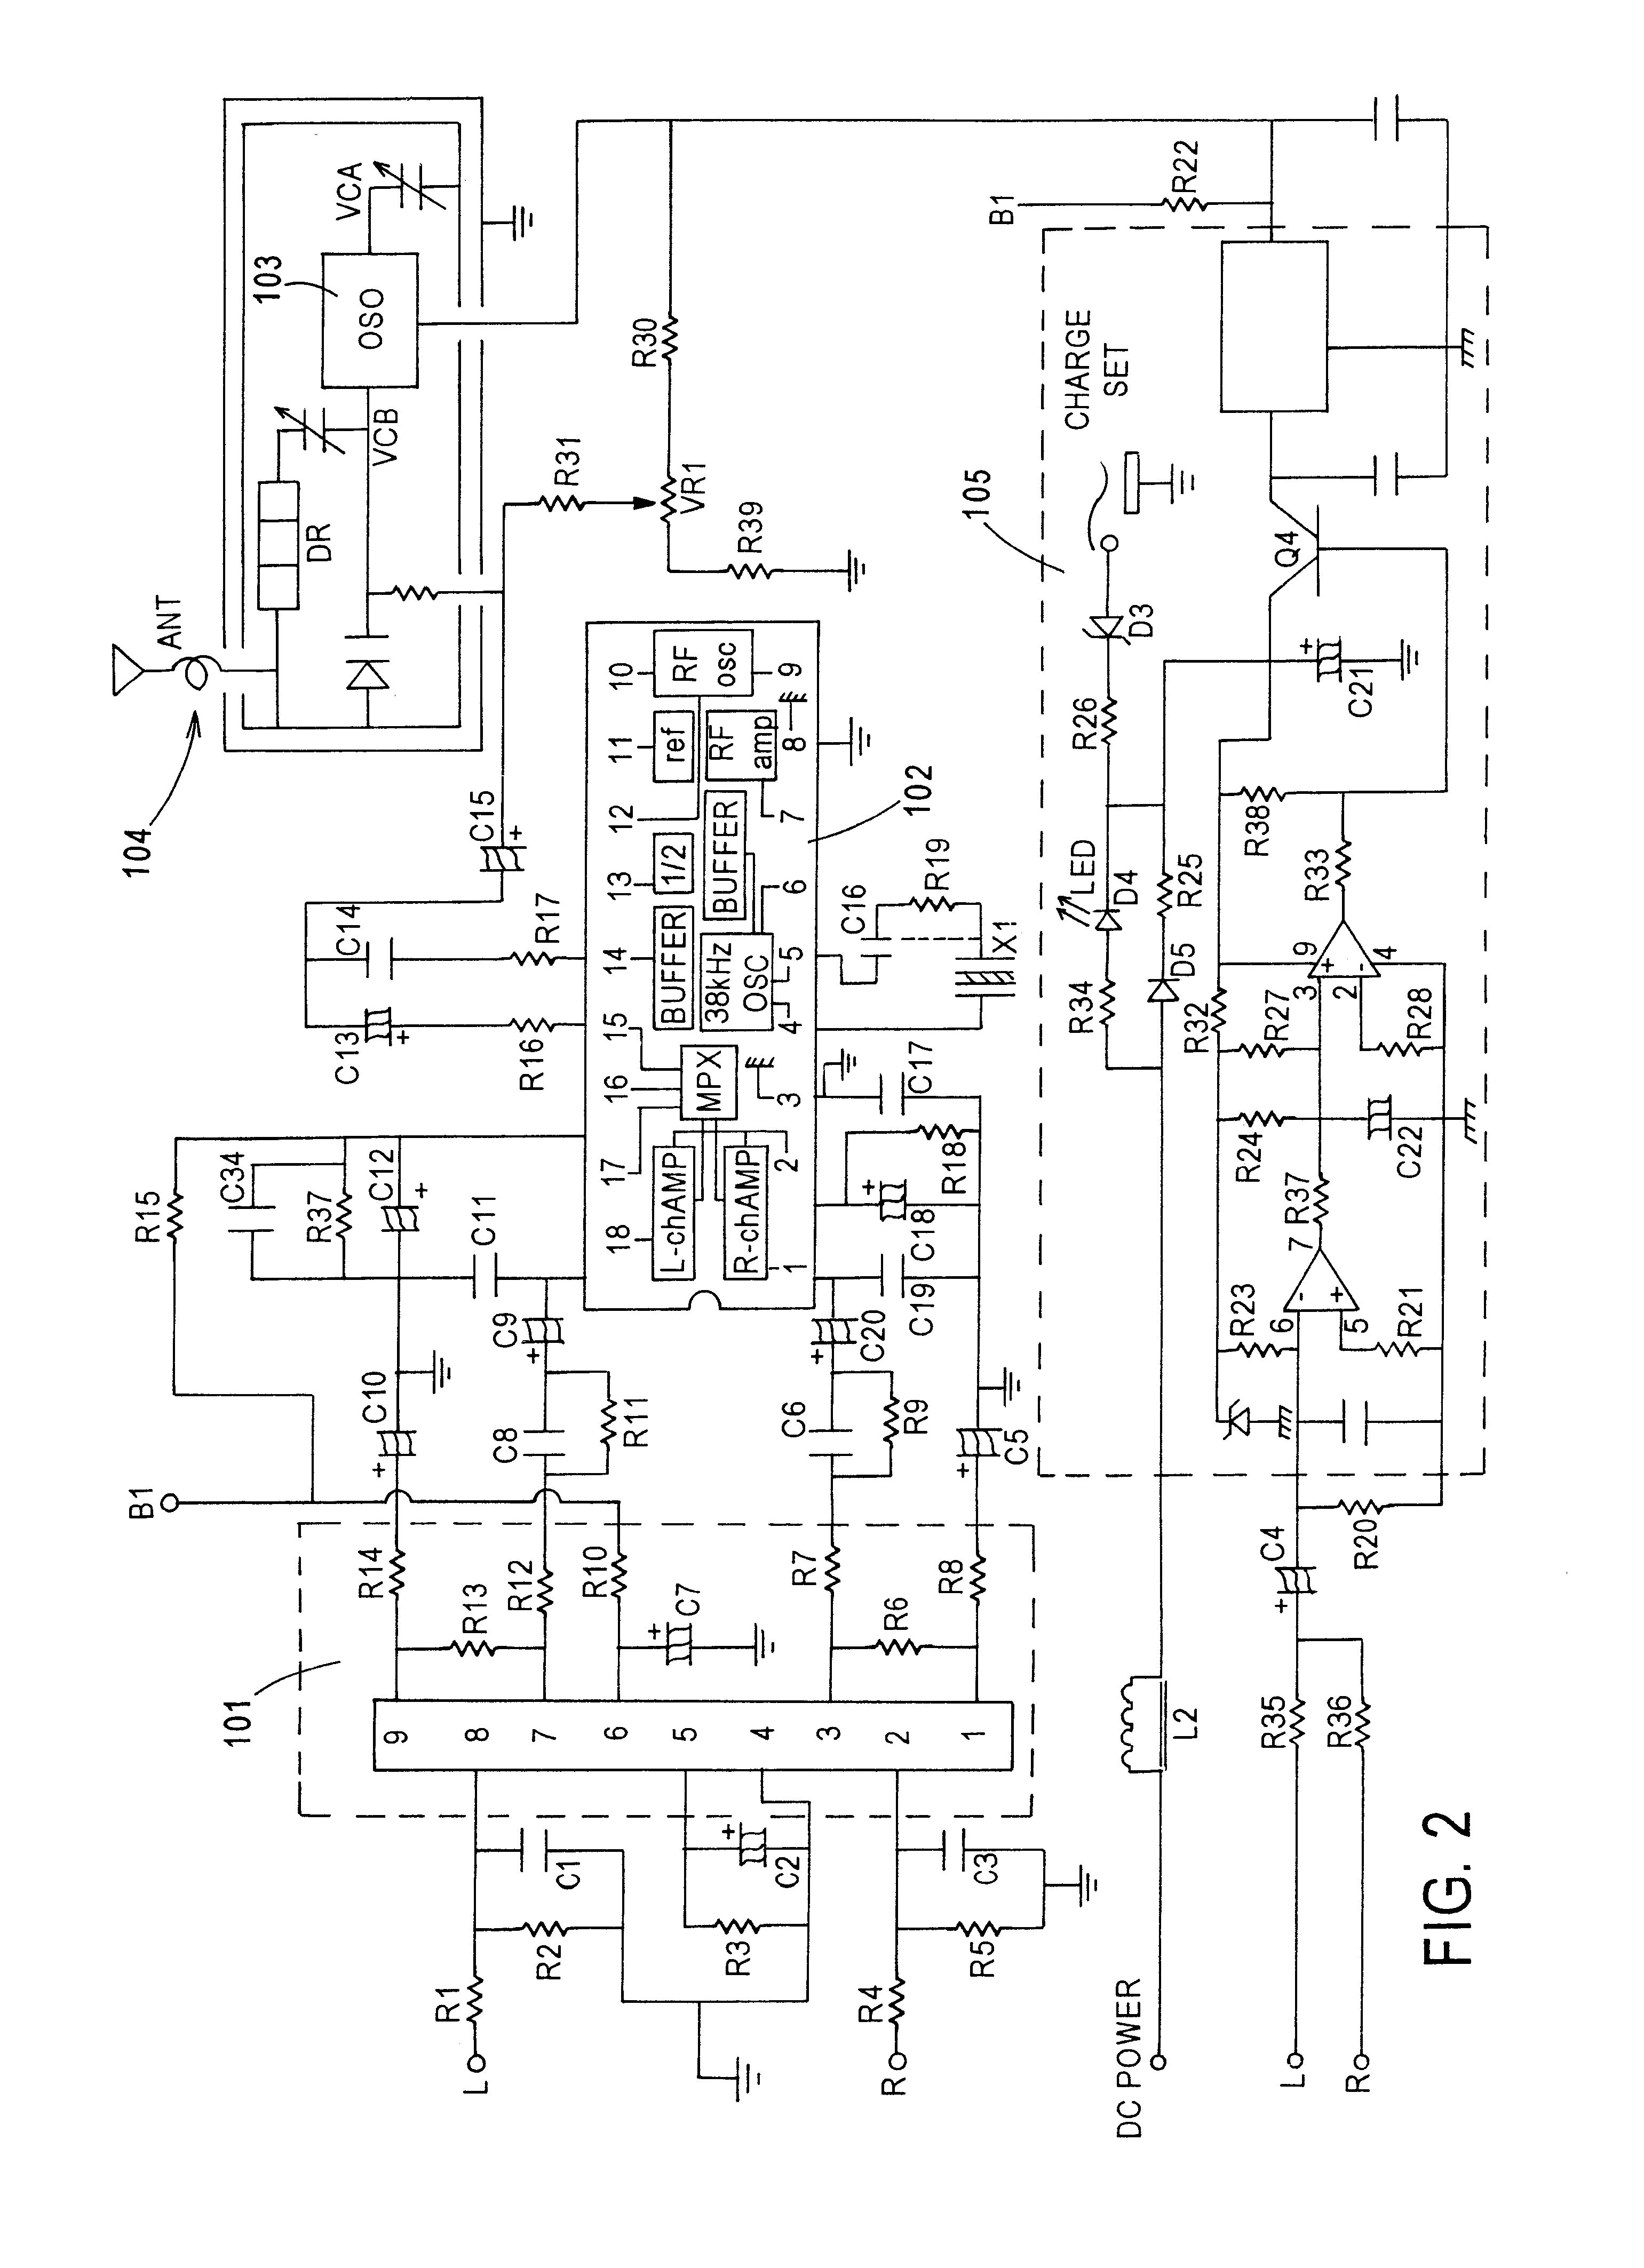 Patent Us6590982 Wireless Stereo Center Speaker System Google Circuit Furthermore Long Range Fm Transmitter Diagram On Ir Drawing